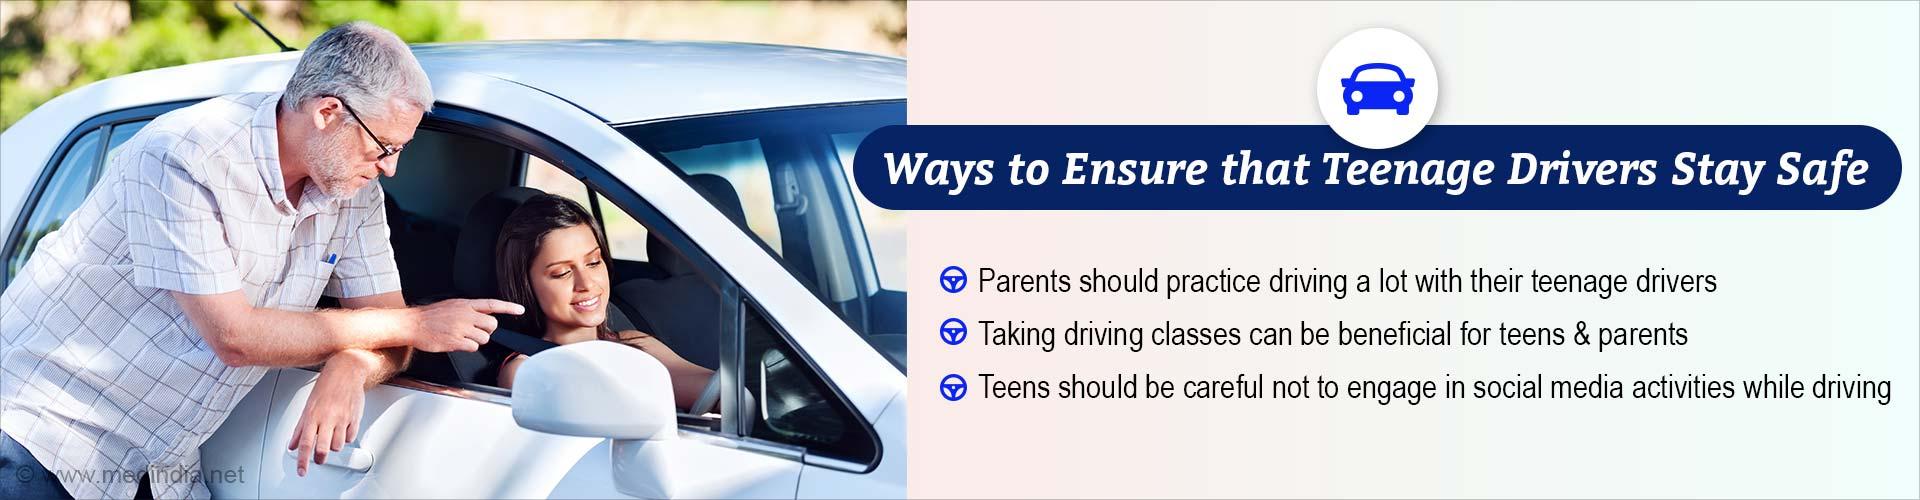 Teenage Driving: Tips to Ensure Safe Driving